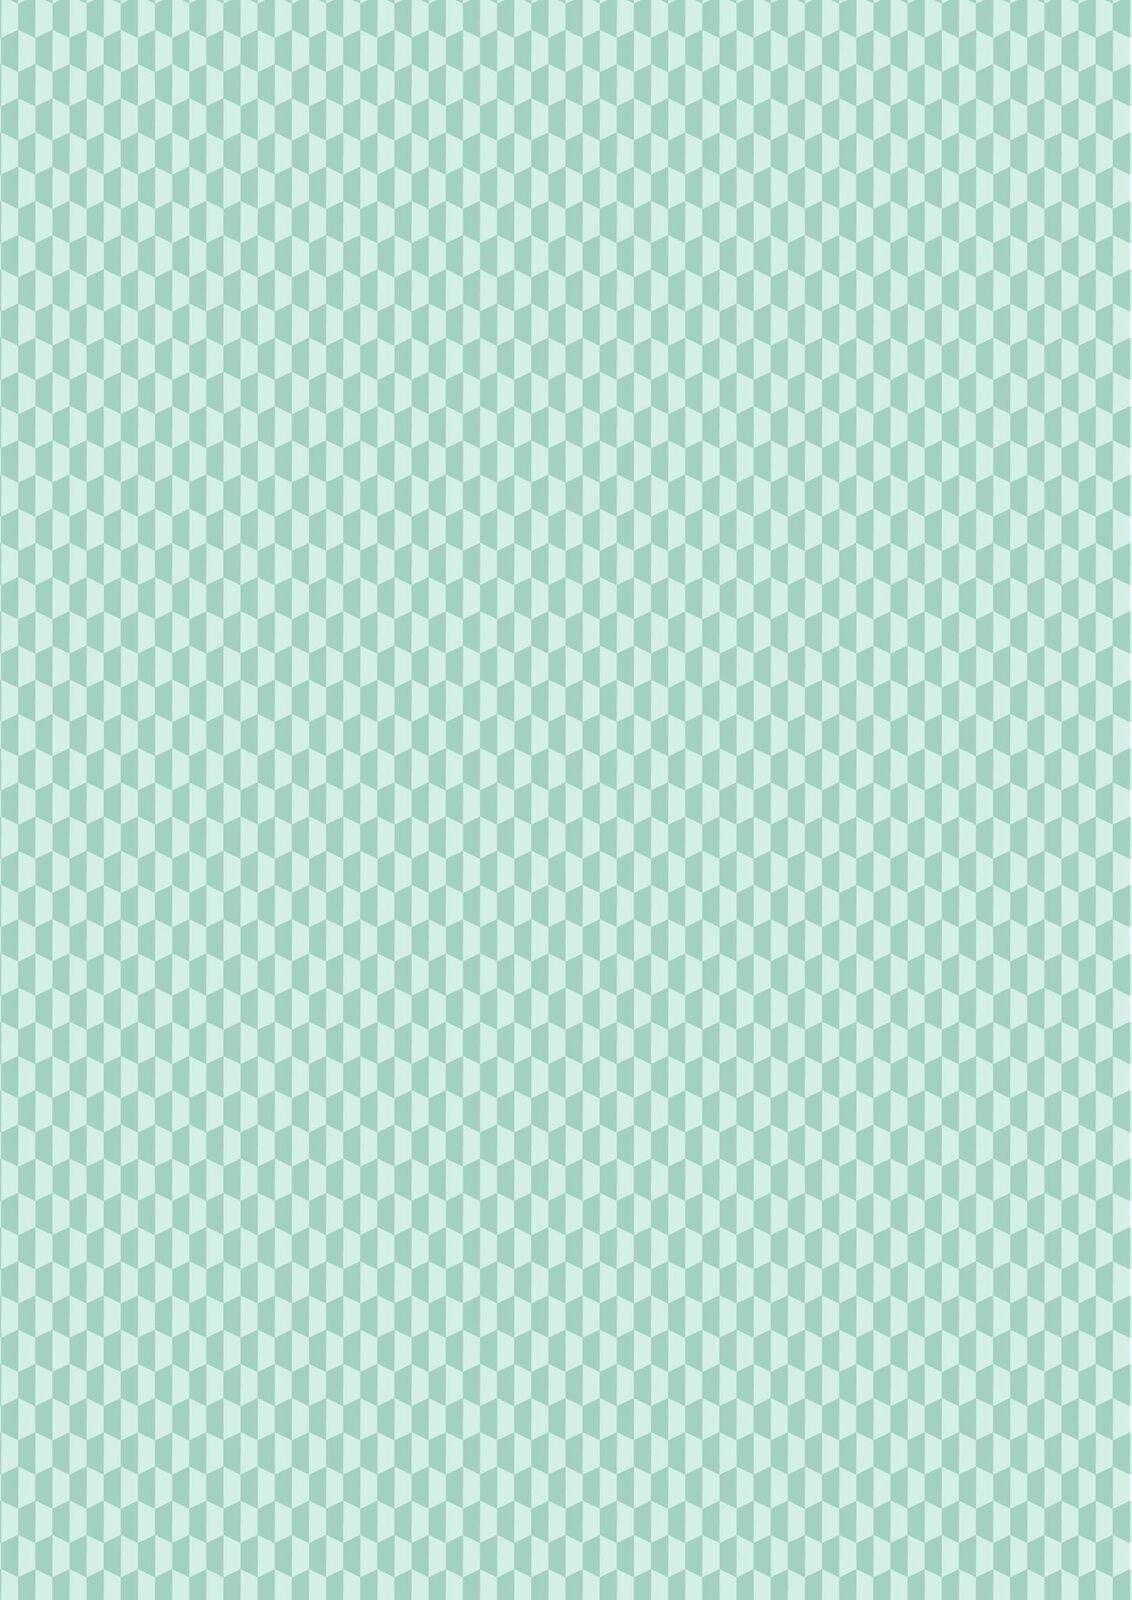 Lewis & Irene Geometrix - Teal Hex- GX4.2